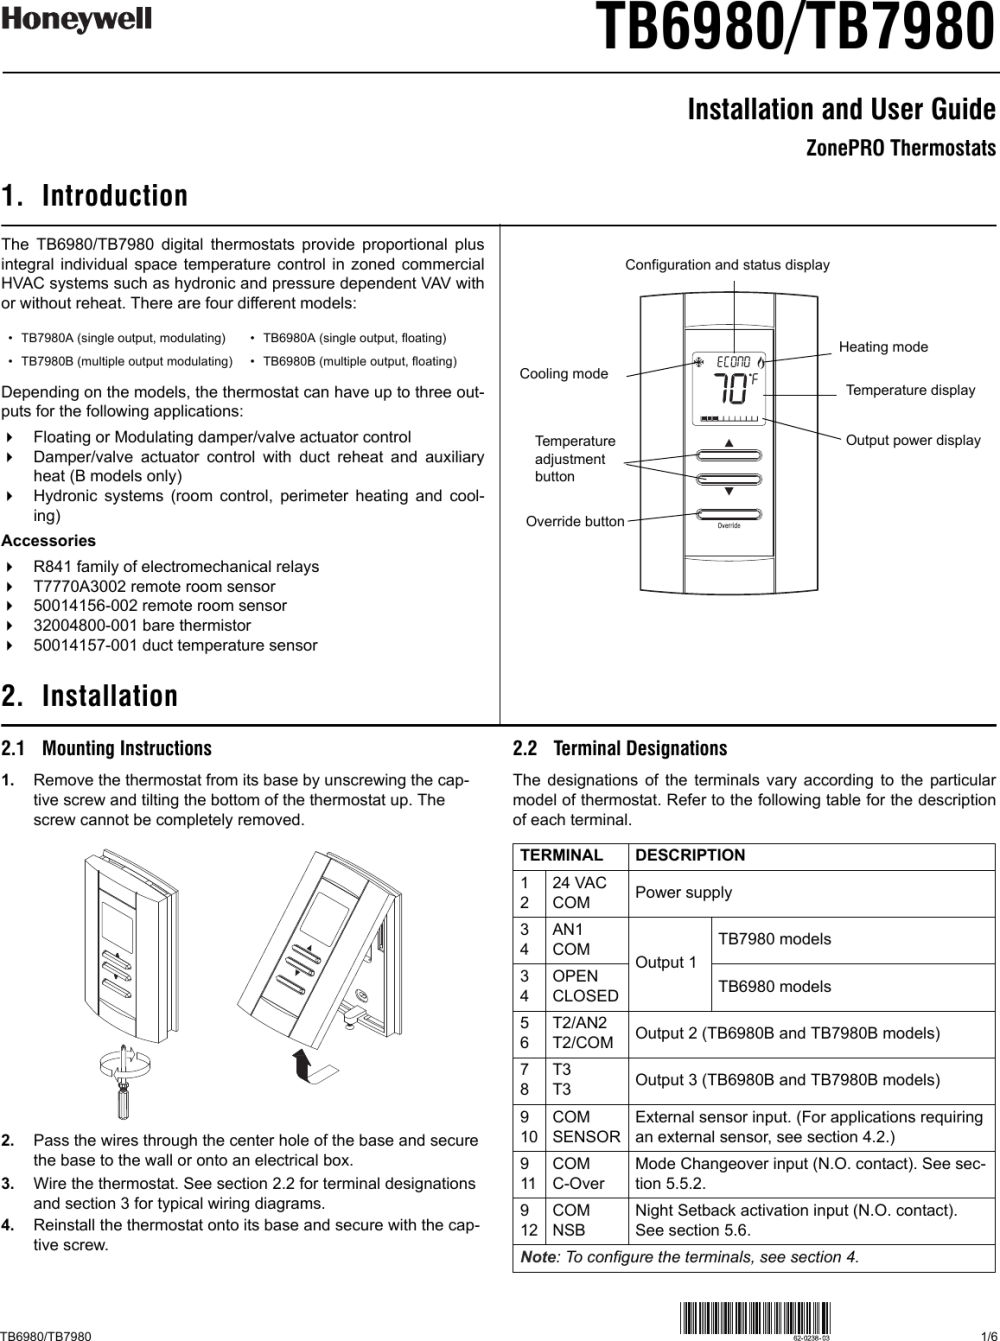 medium resolution of honeywell thermostat tb6980 users manual 62 0238 03 tb6980 tb7980 honeywell s th150 eng